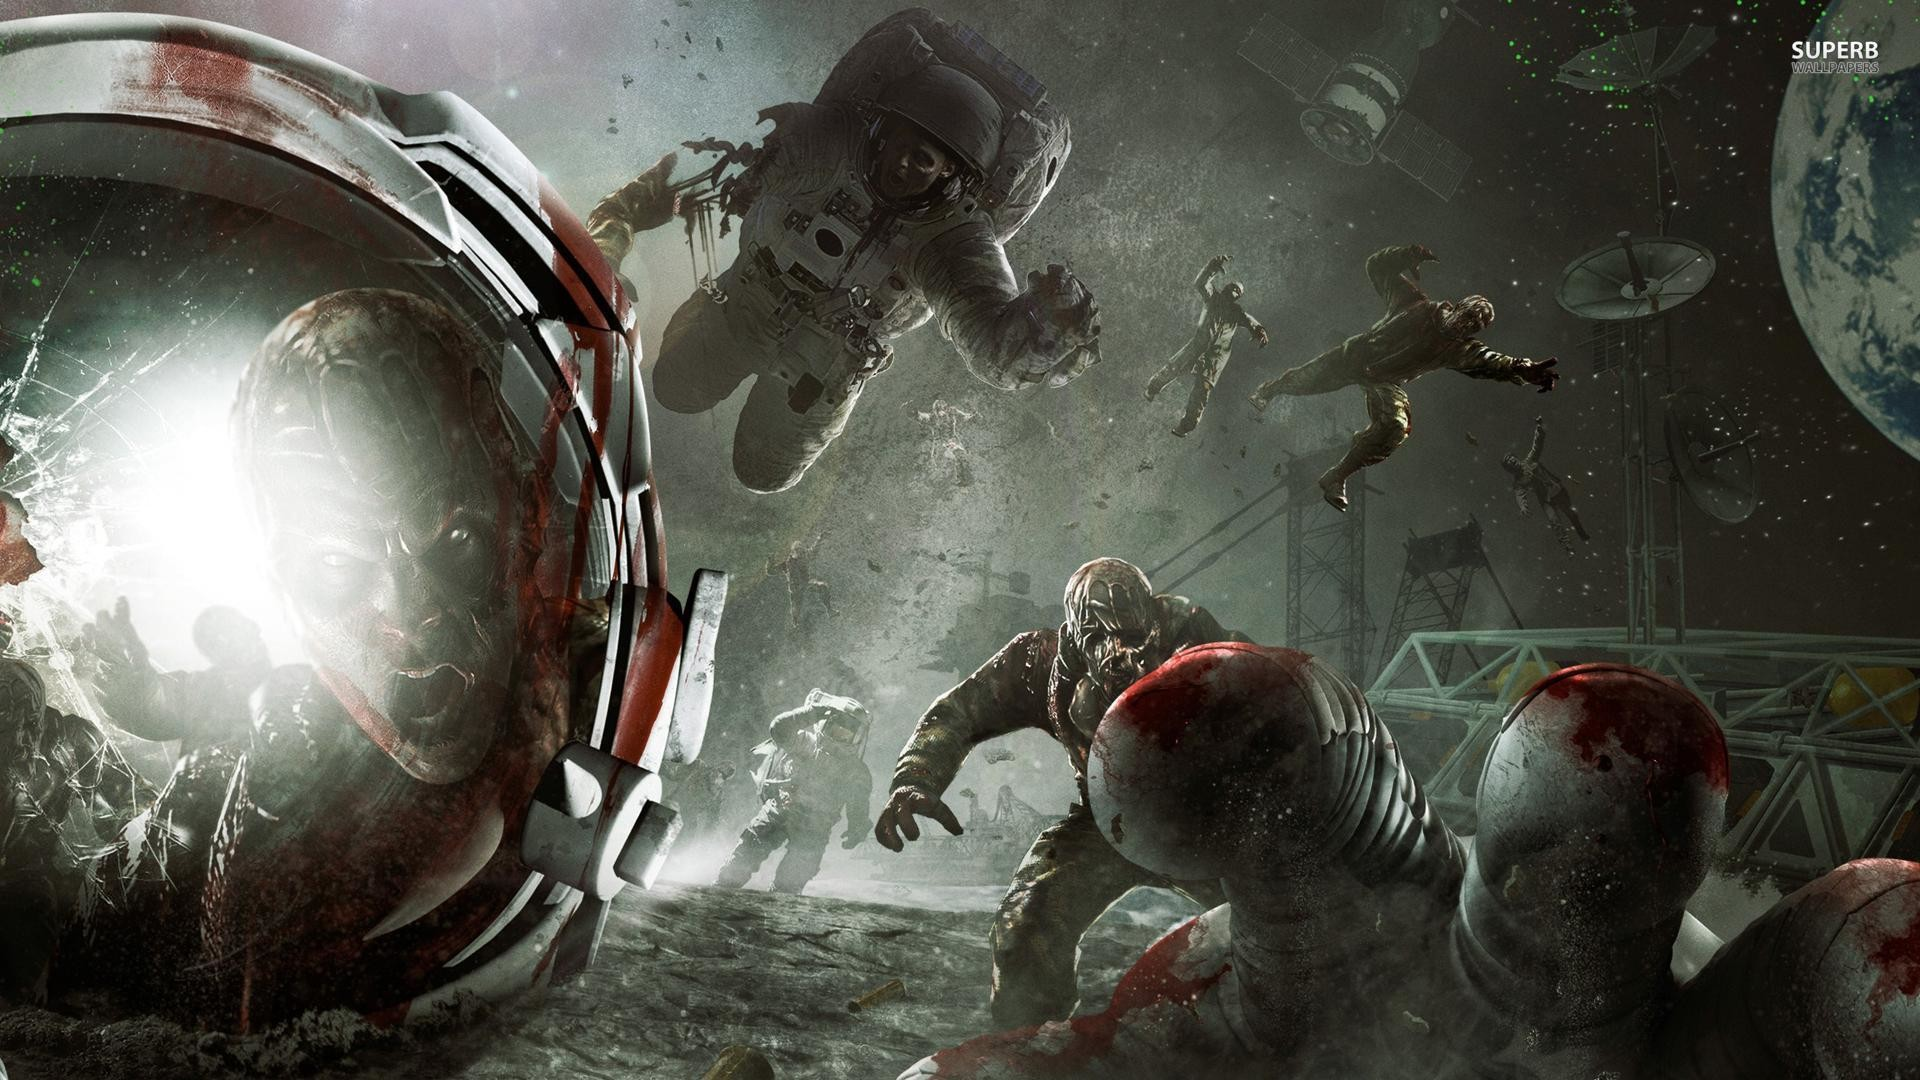 Of Duty Black Ops 2 Zombies Wallpaper Origins HD Wallpaper | GamesHD .